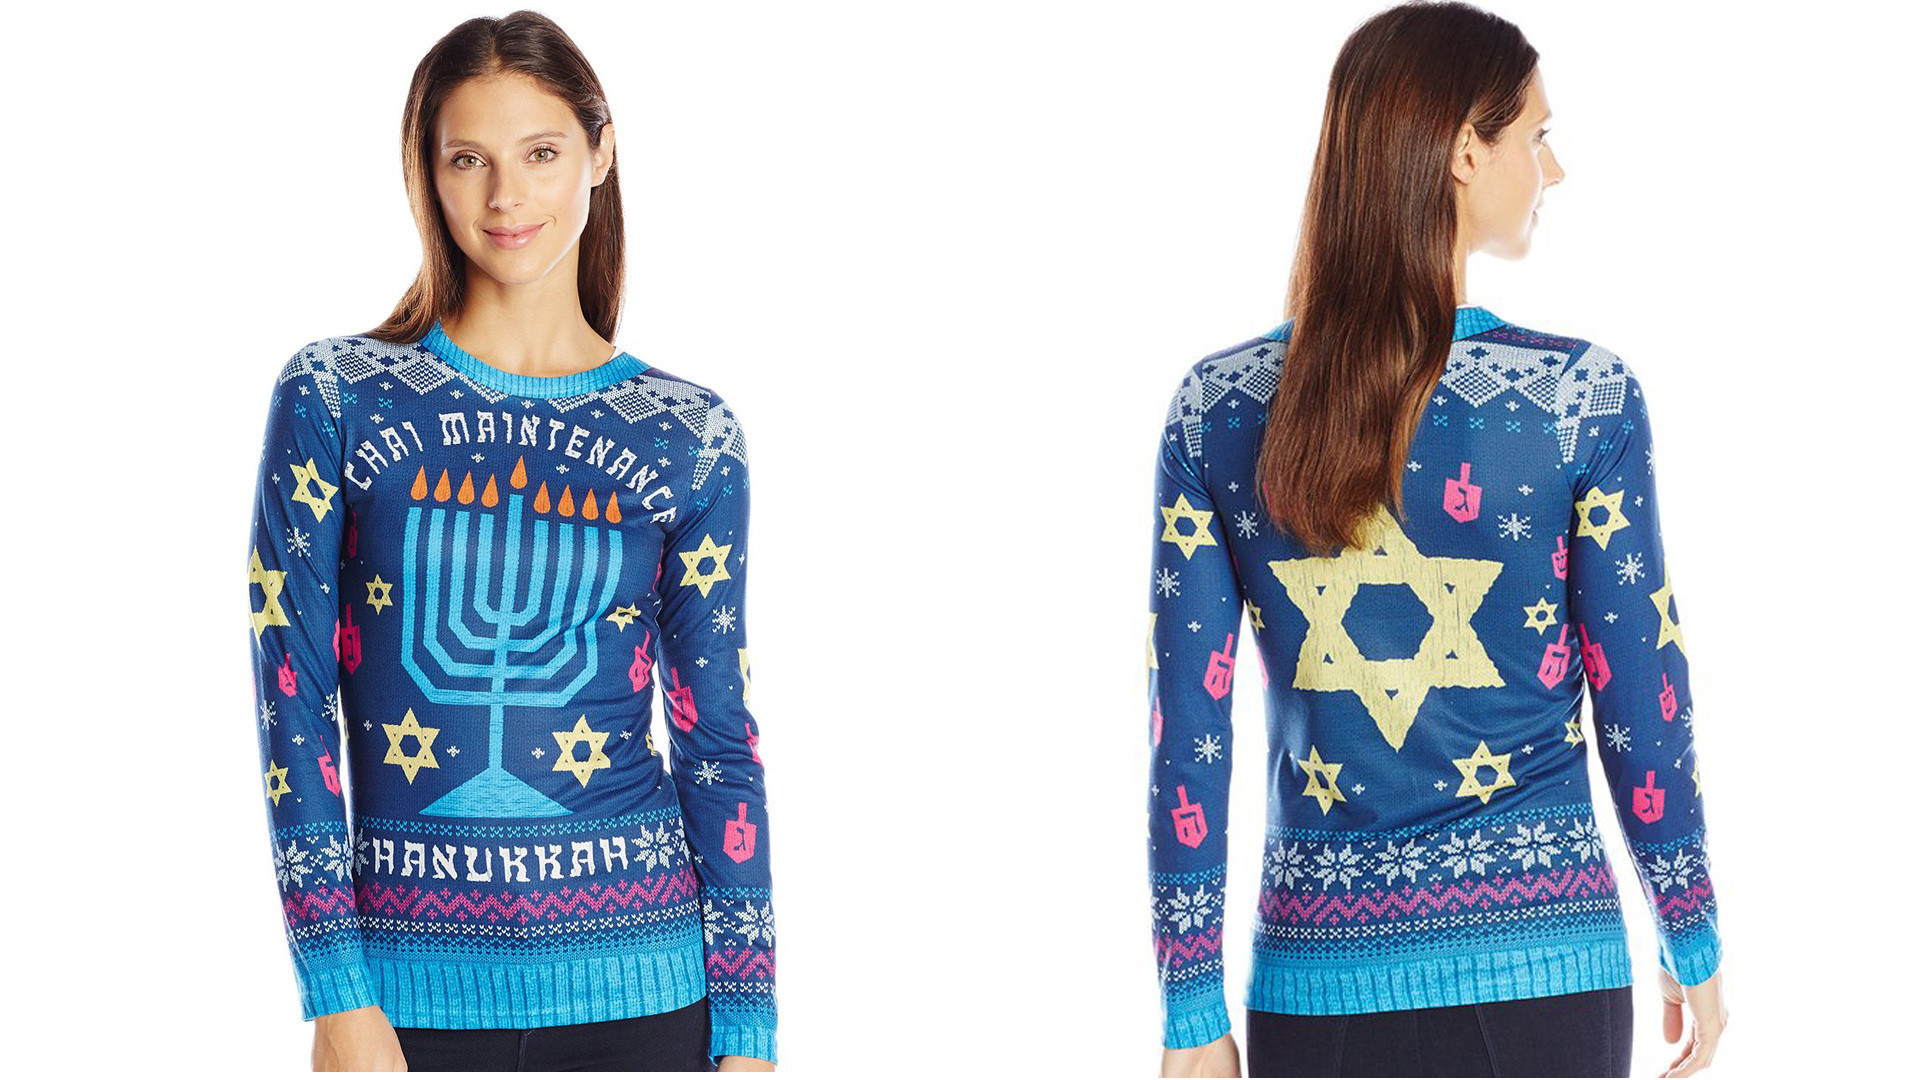 Nordstrom pulls controversial Hanukkah sweater after Facebook ...